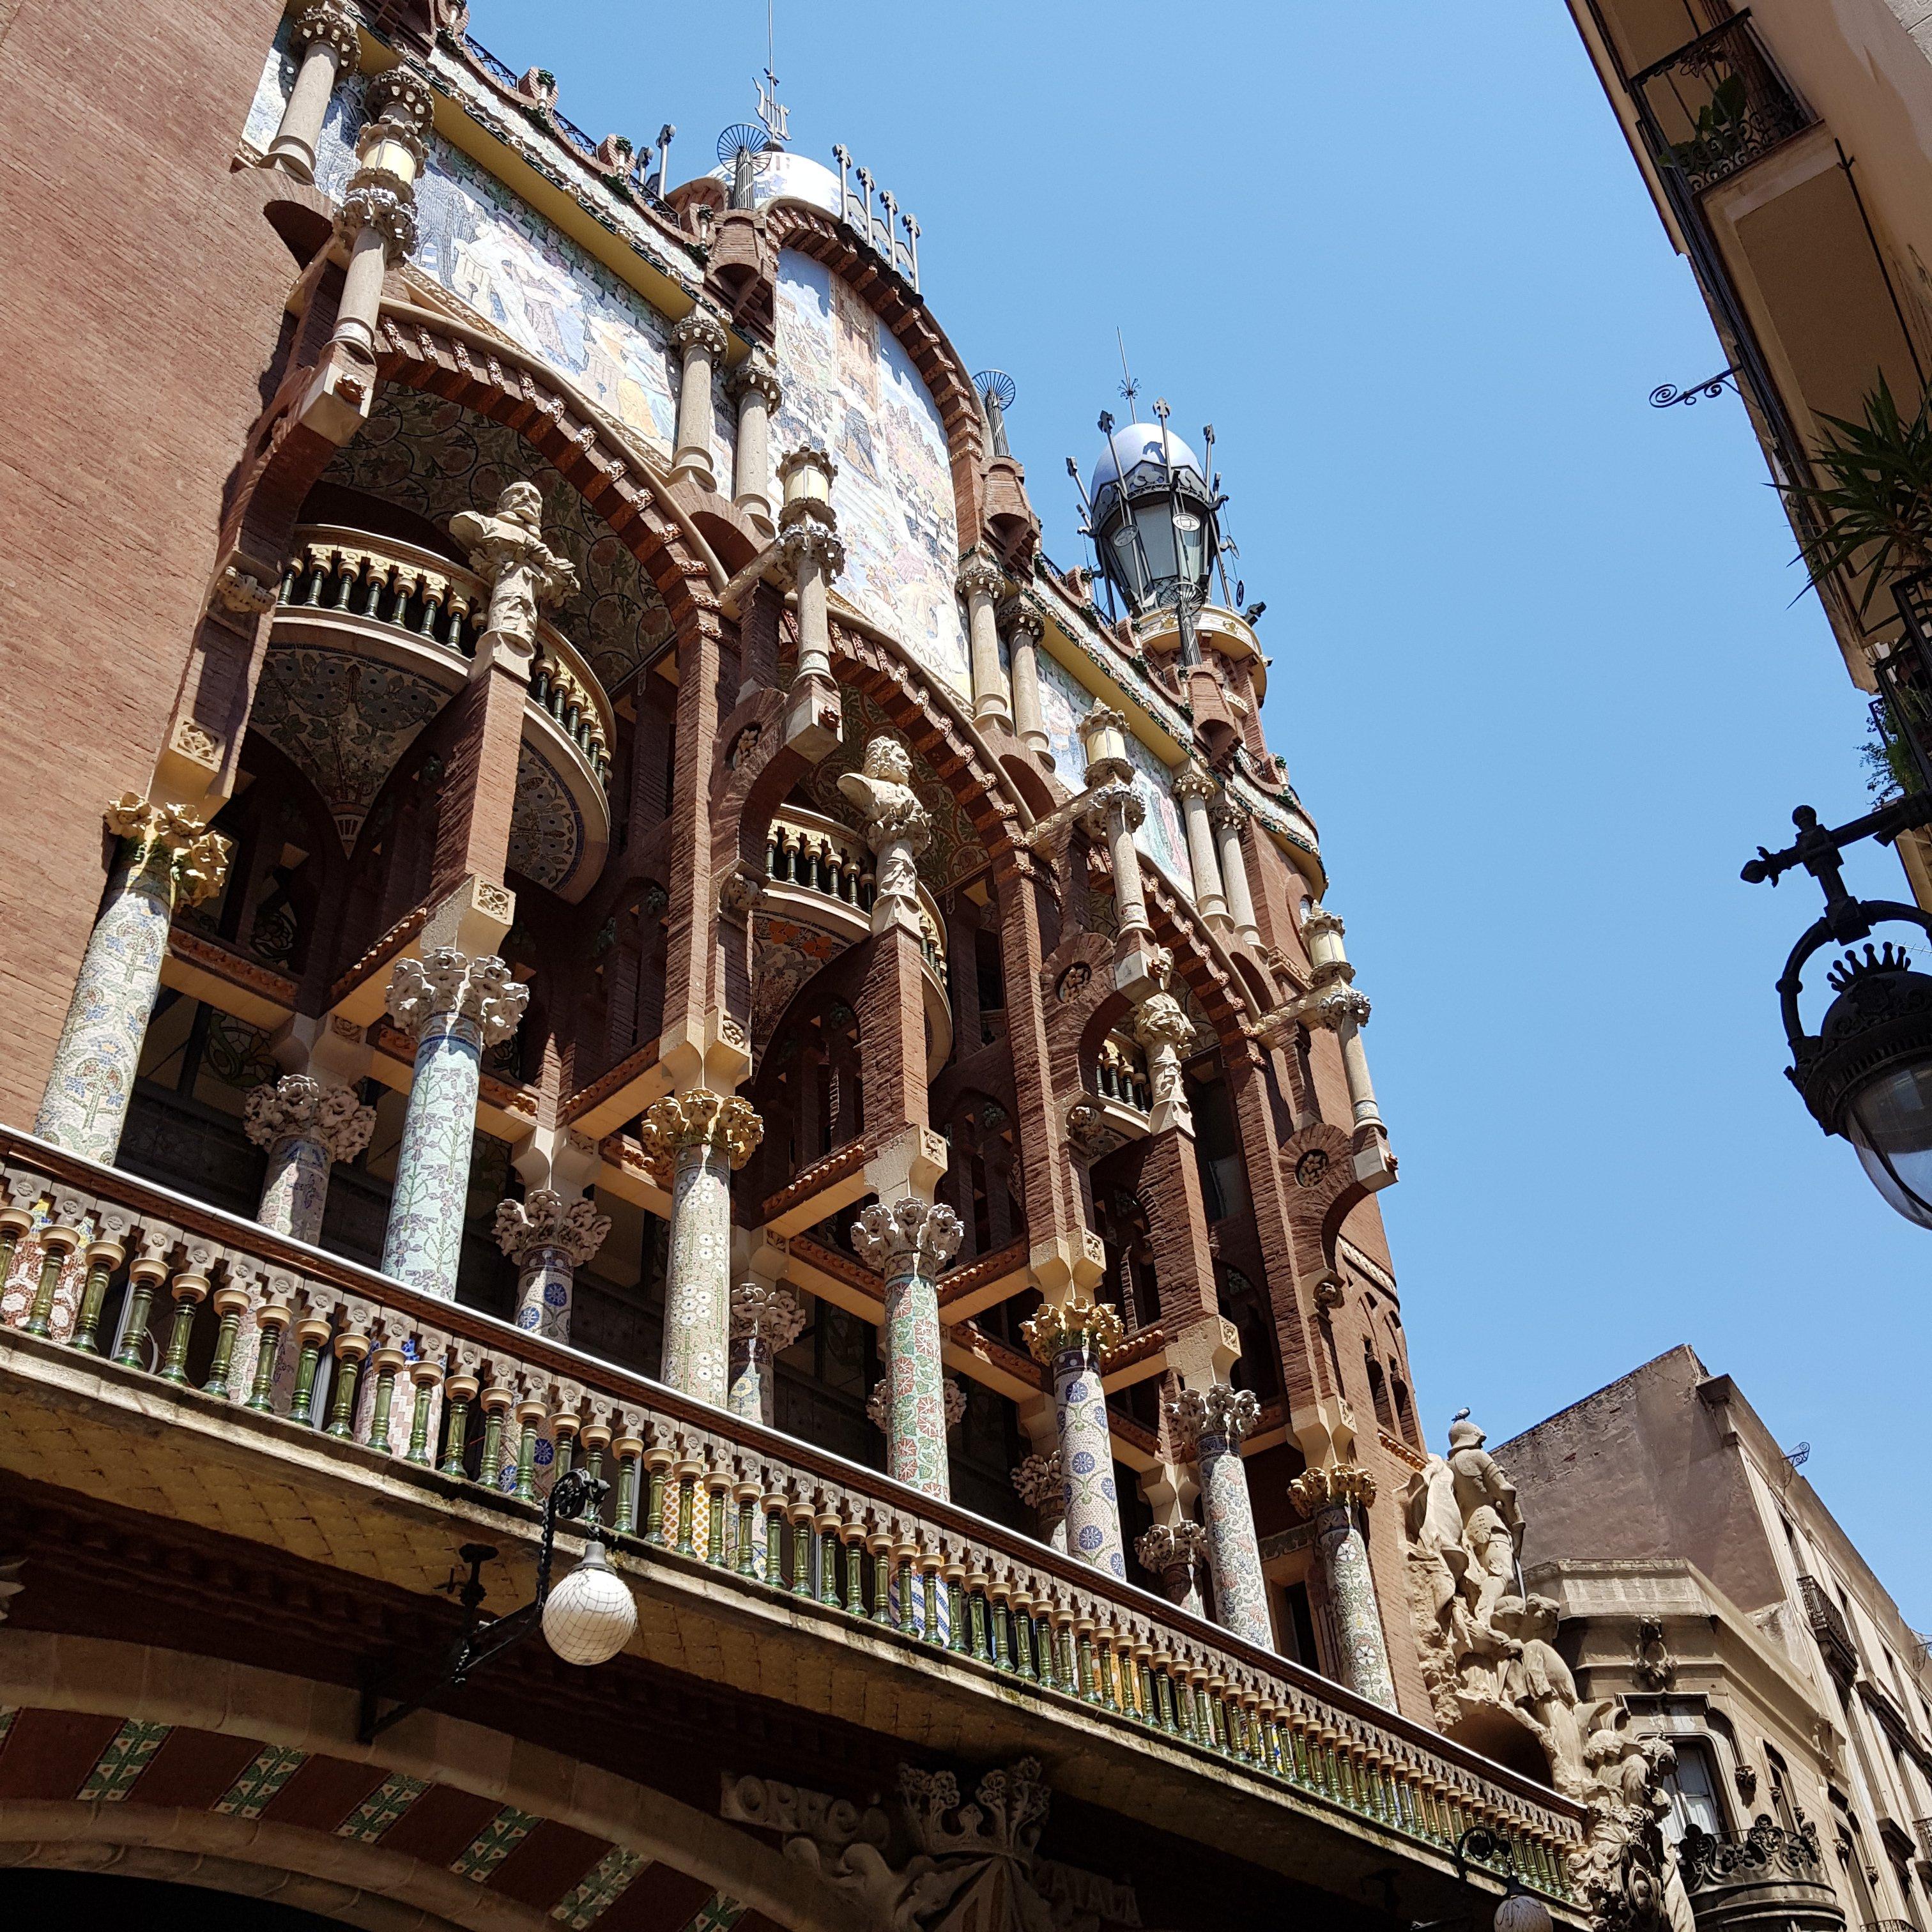 Palau de la Música Catalana in Barcelona